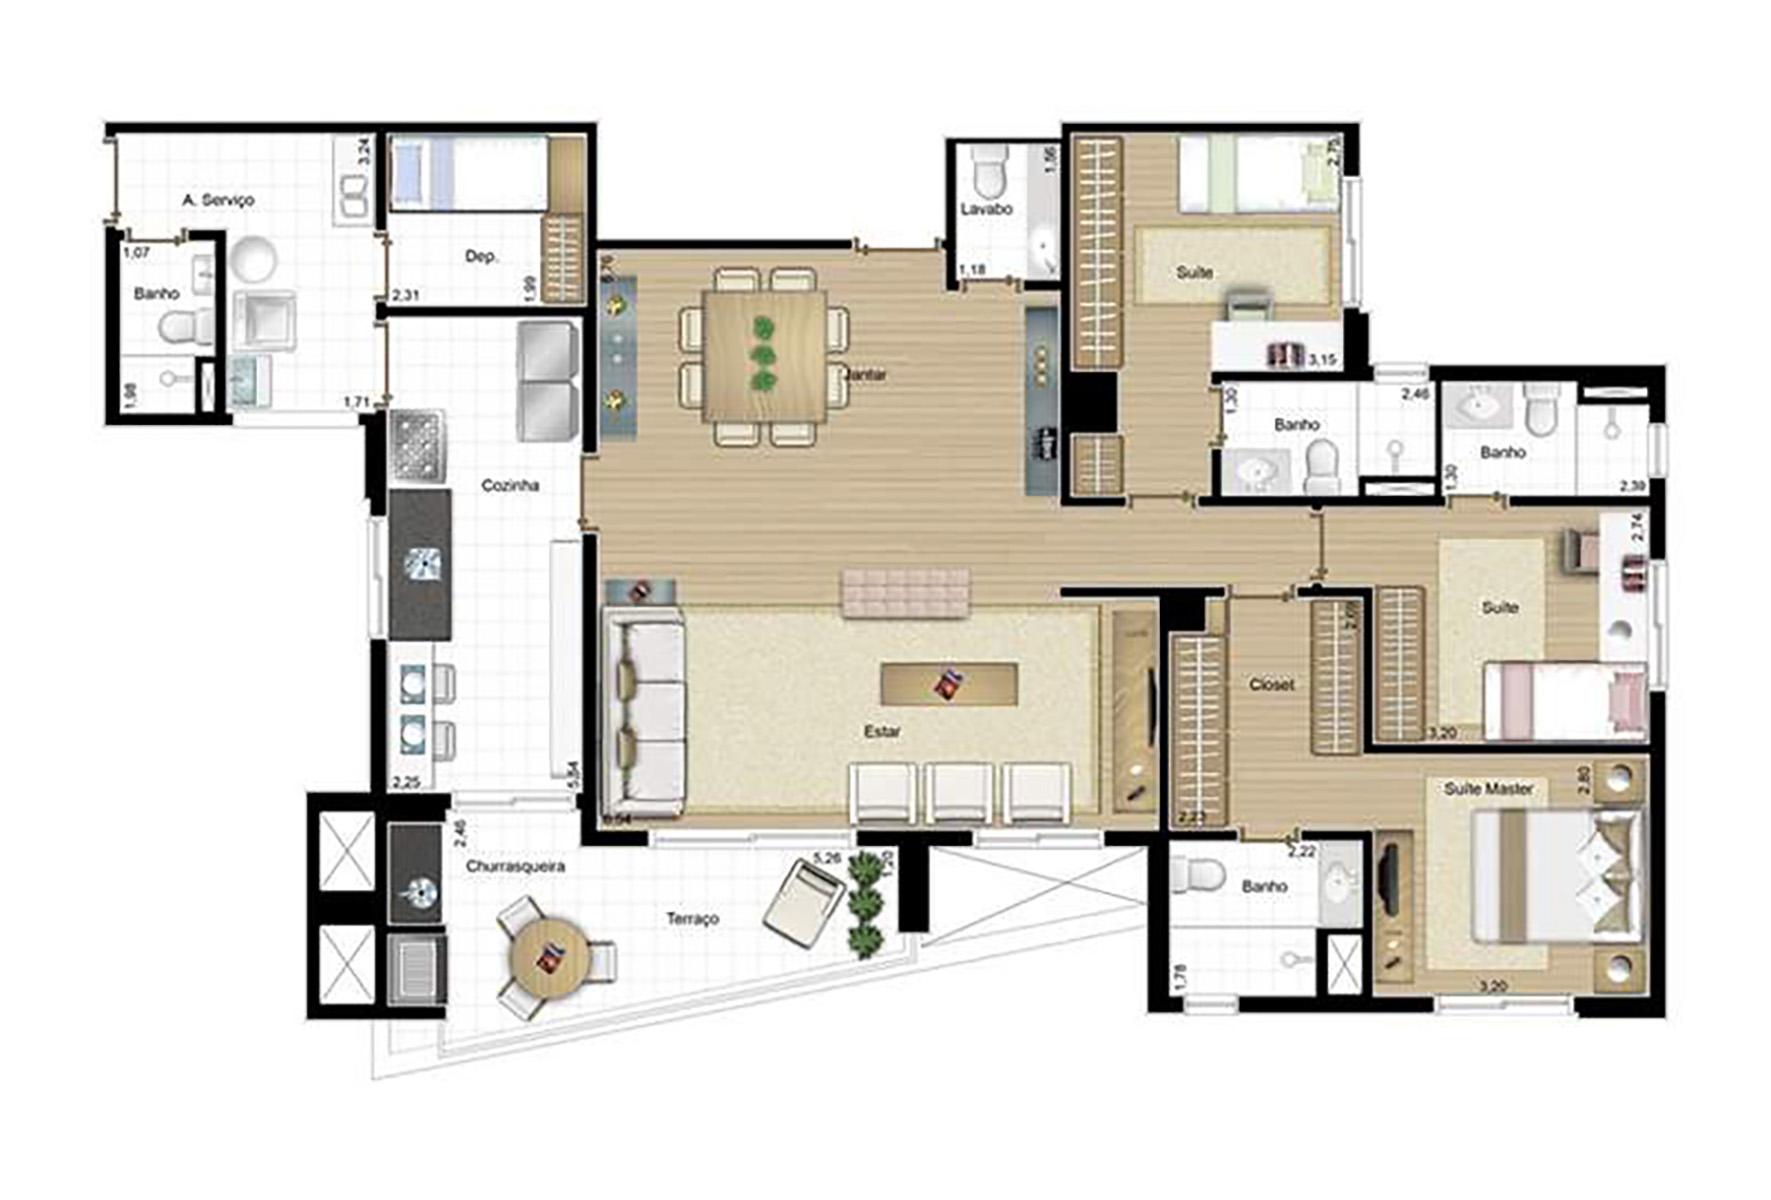 Ilustração Artística da Planta Sala Ampliada 3 suites 150m² Passarim